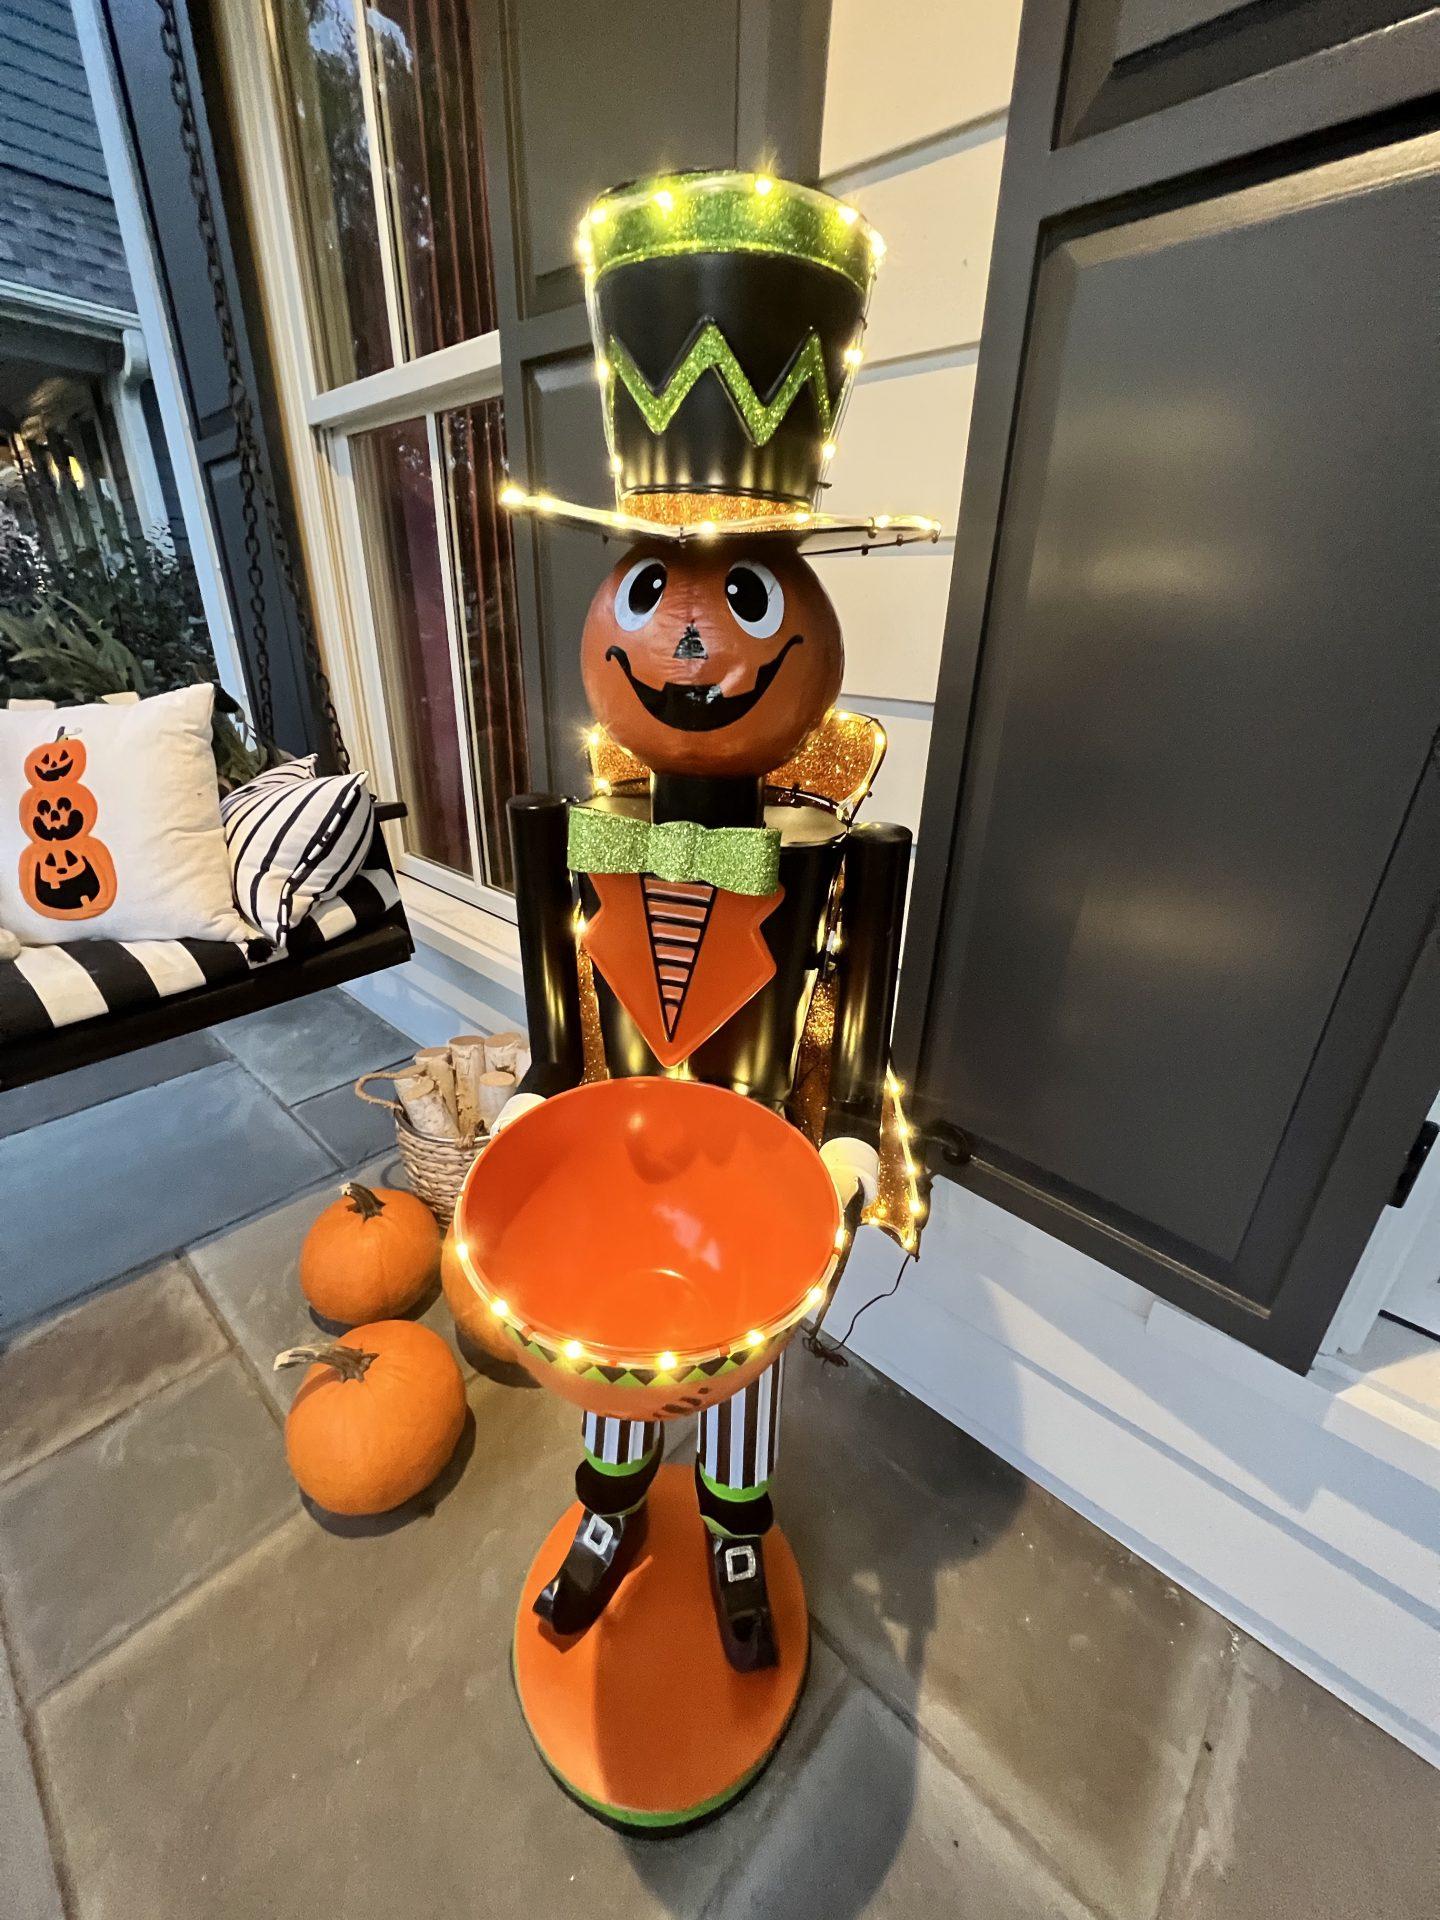 fall decorations, fall decor, halloween decorations, halloween decor, home decor, home design, home decorations, sweater weather, fall style, fall fashion, fall fun